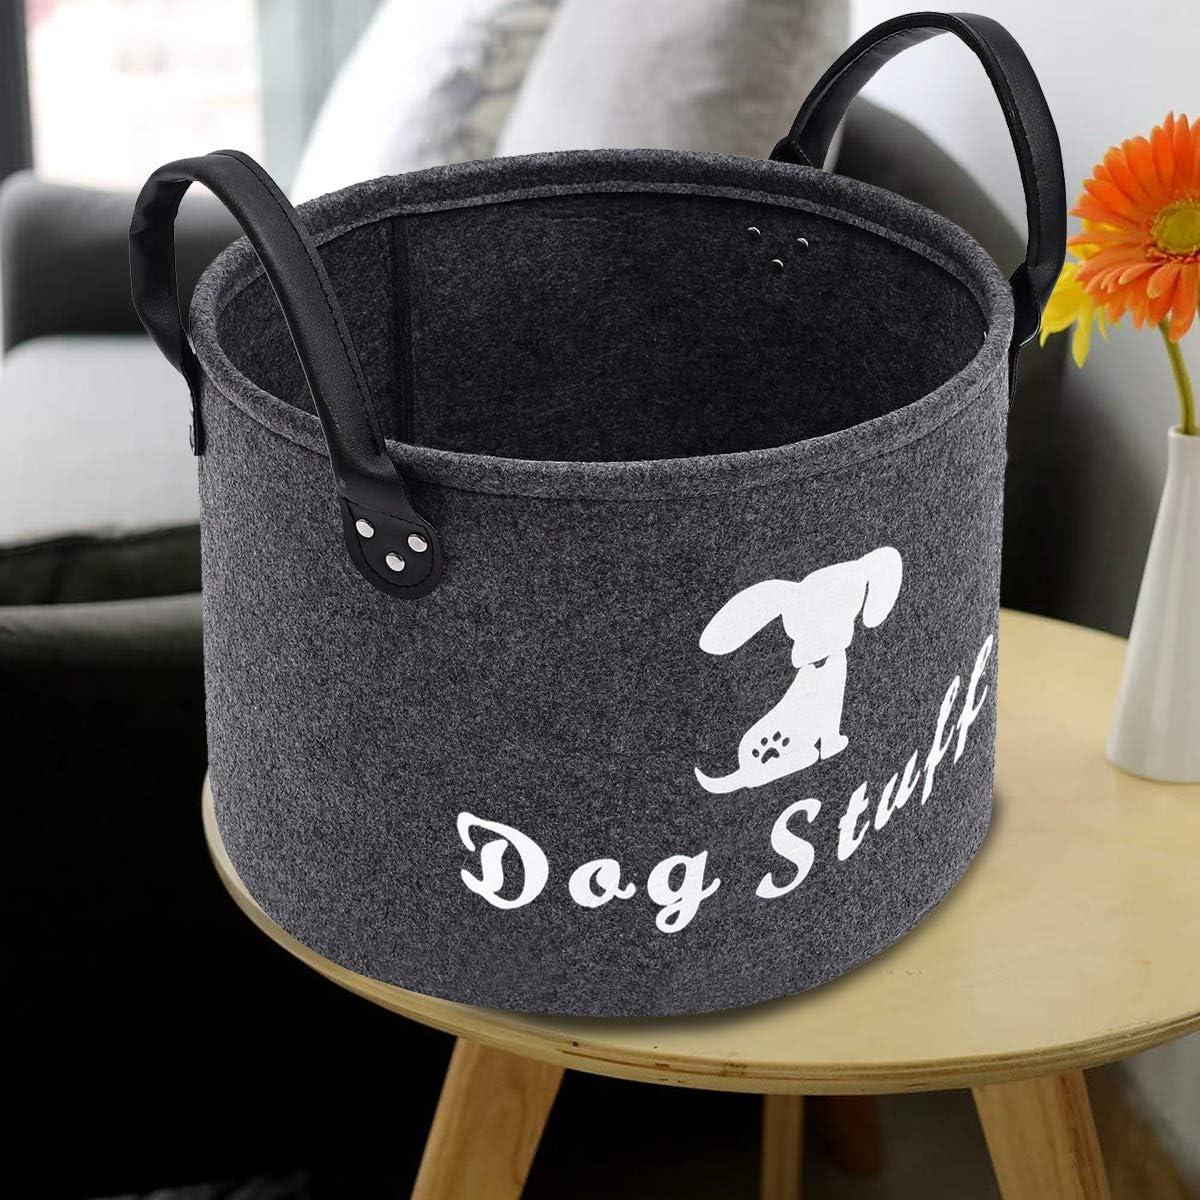 Collapsible Convenient Organizer Basket cat stuff, dark gary Space-Saving Box for Organizing Pet Chew Toys Blankets leashes ECOSCO Round Felt Pet Dog Cat Toy Storage